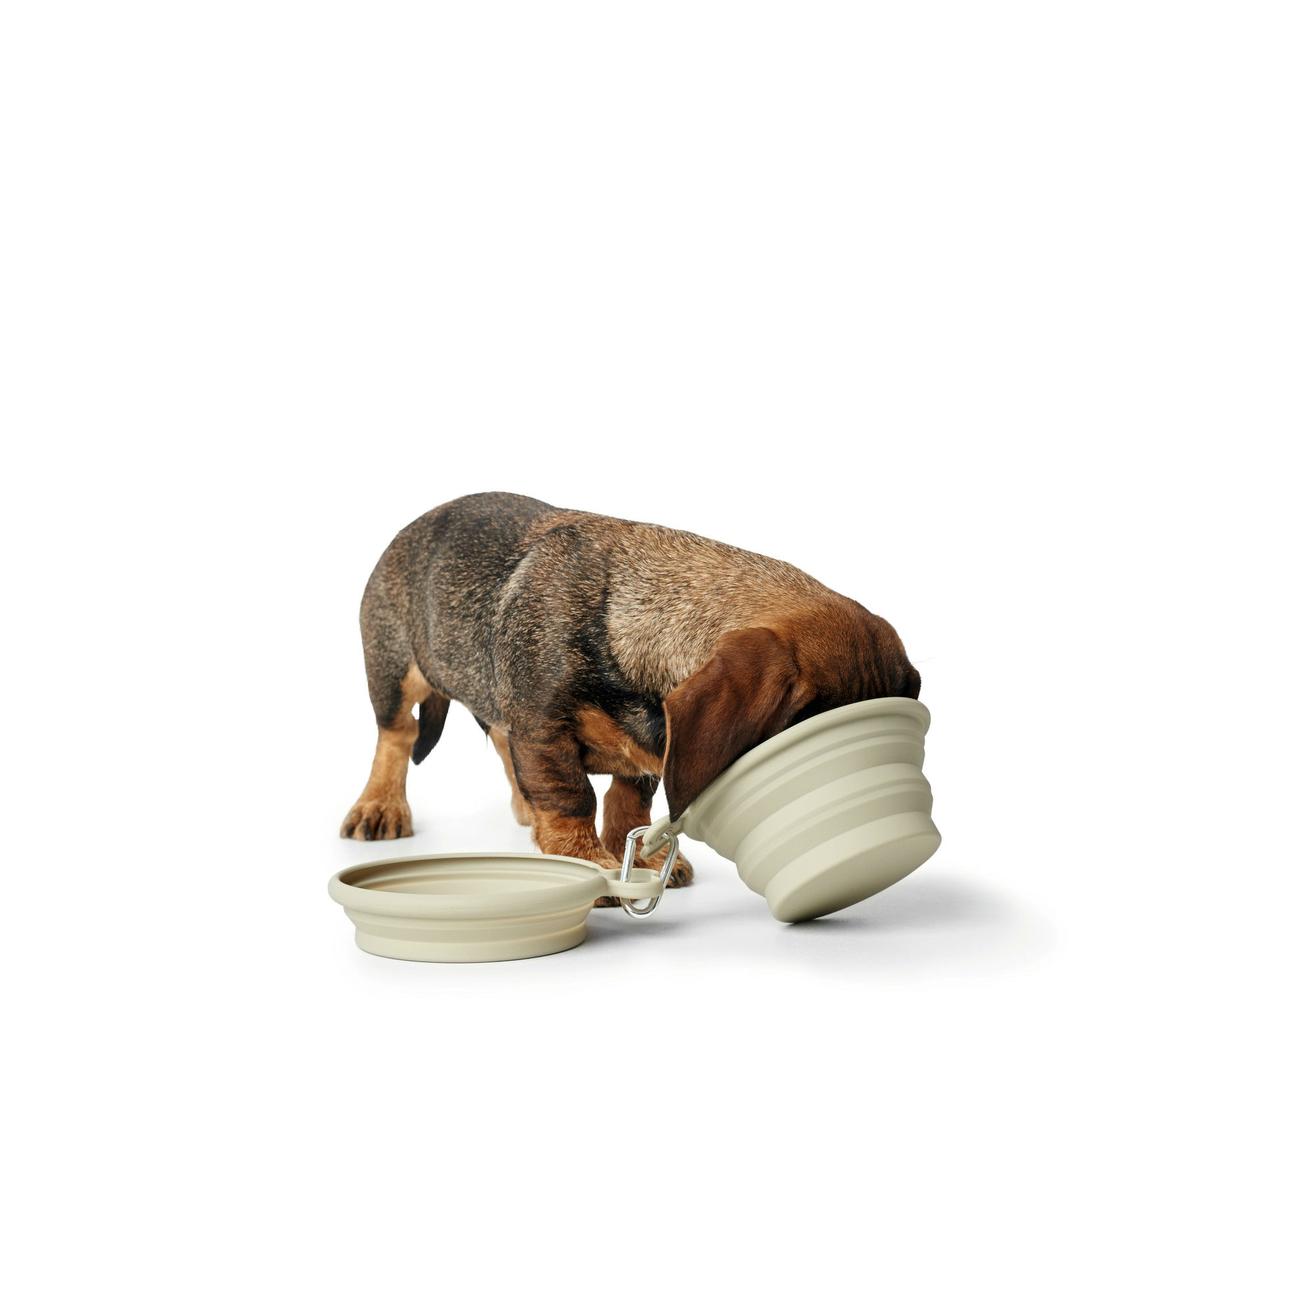 Hunter Silikon Reisenapf List für Hunde 65135, Bild 8